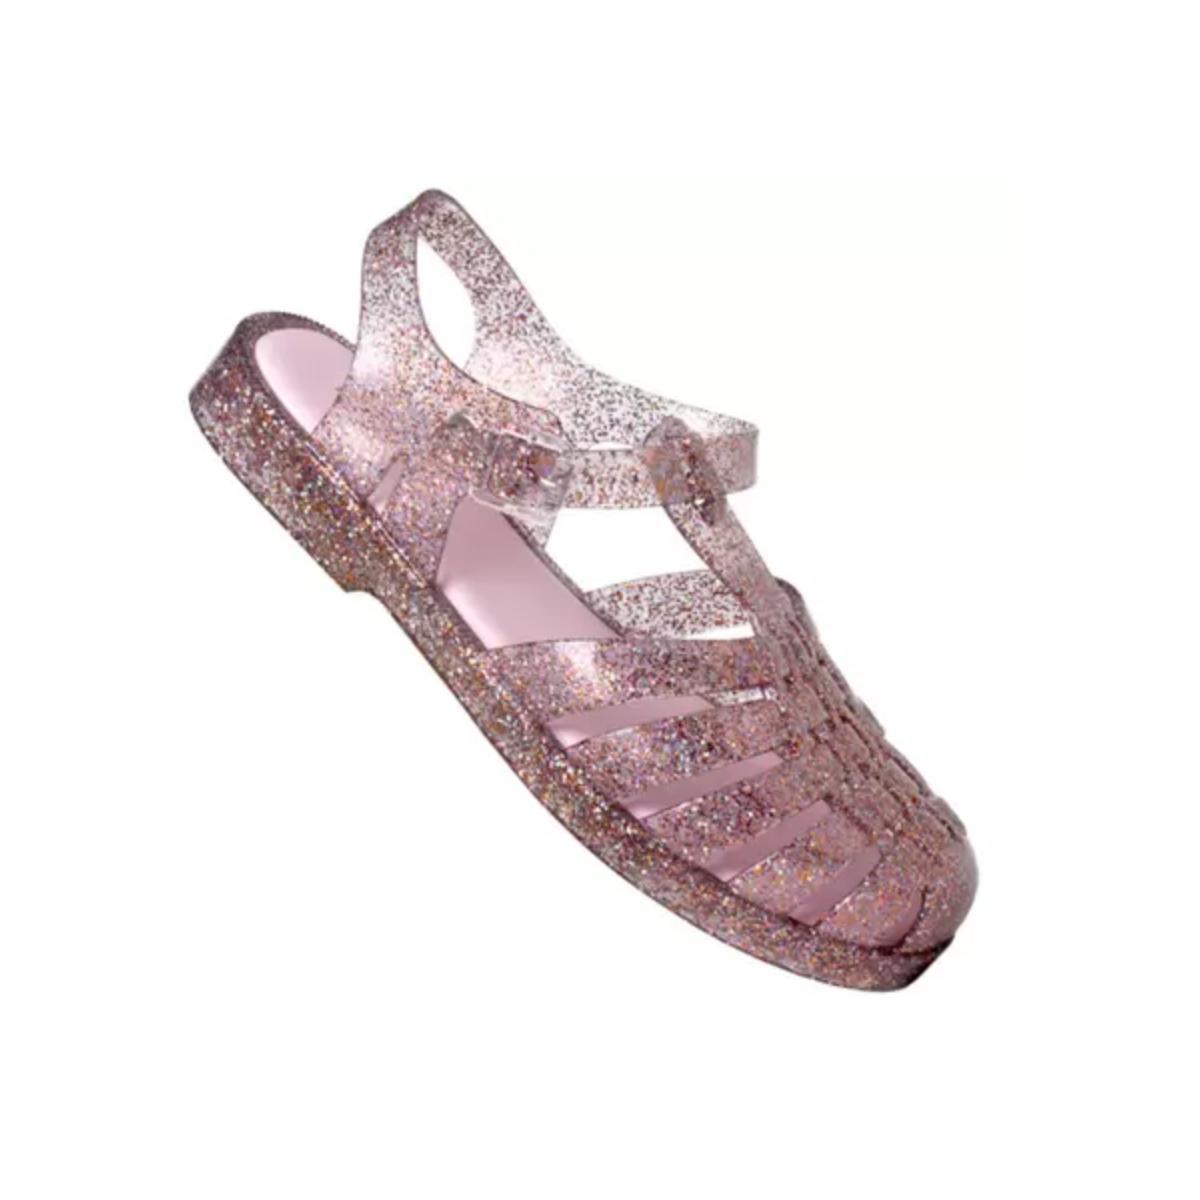 Sandália Feminina Melissa 33276 53810 Possession Fluor Glitter Misto/rosa